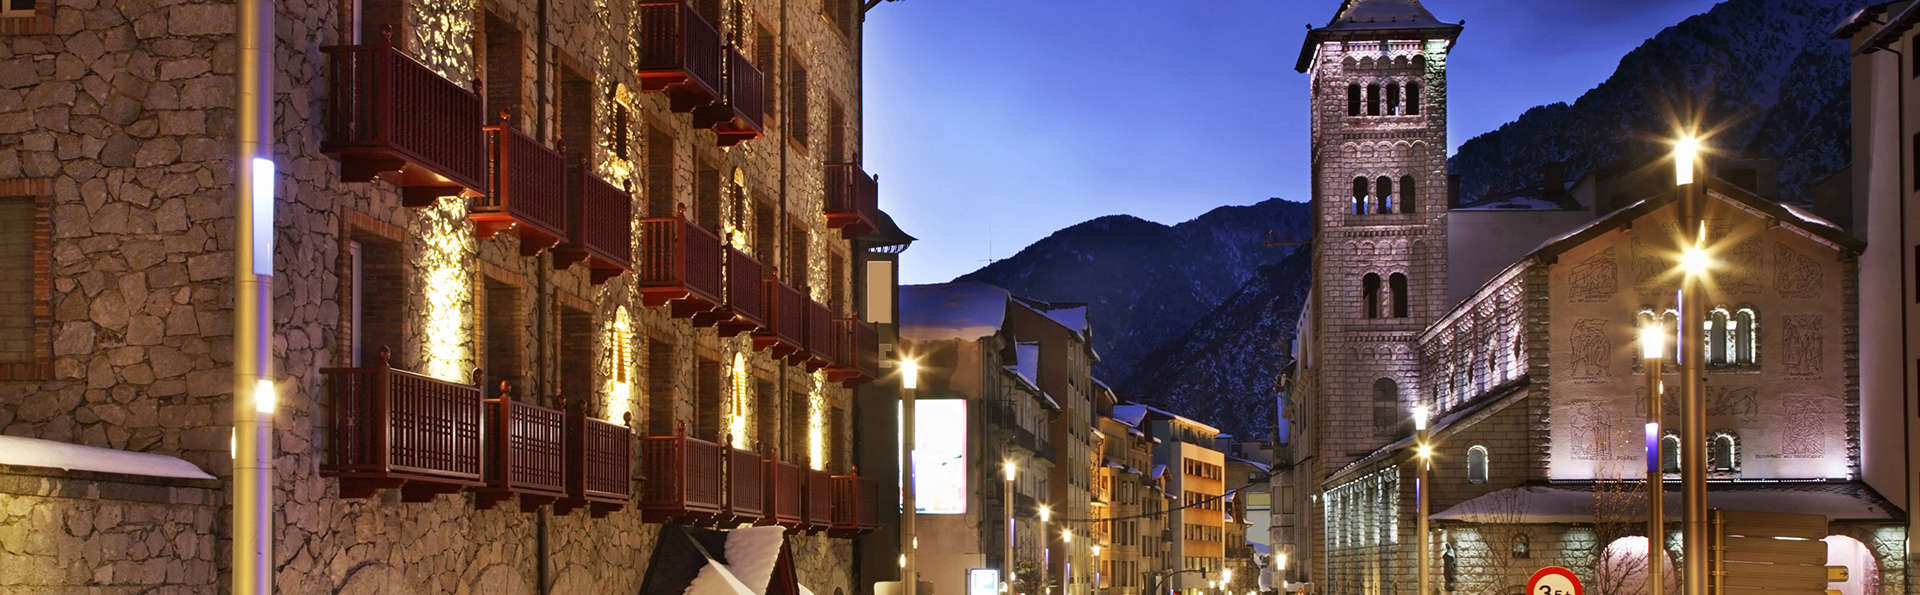 Hotel Spa Termes SERHS Carlemany - edit_andorra_la_vella1.jpg